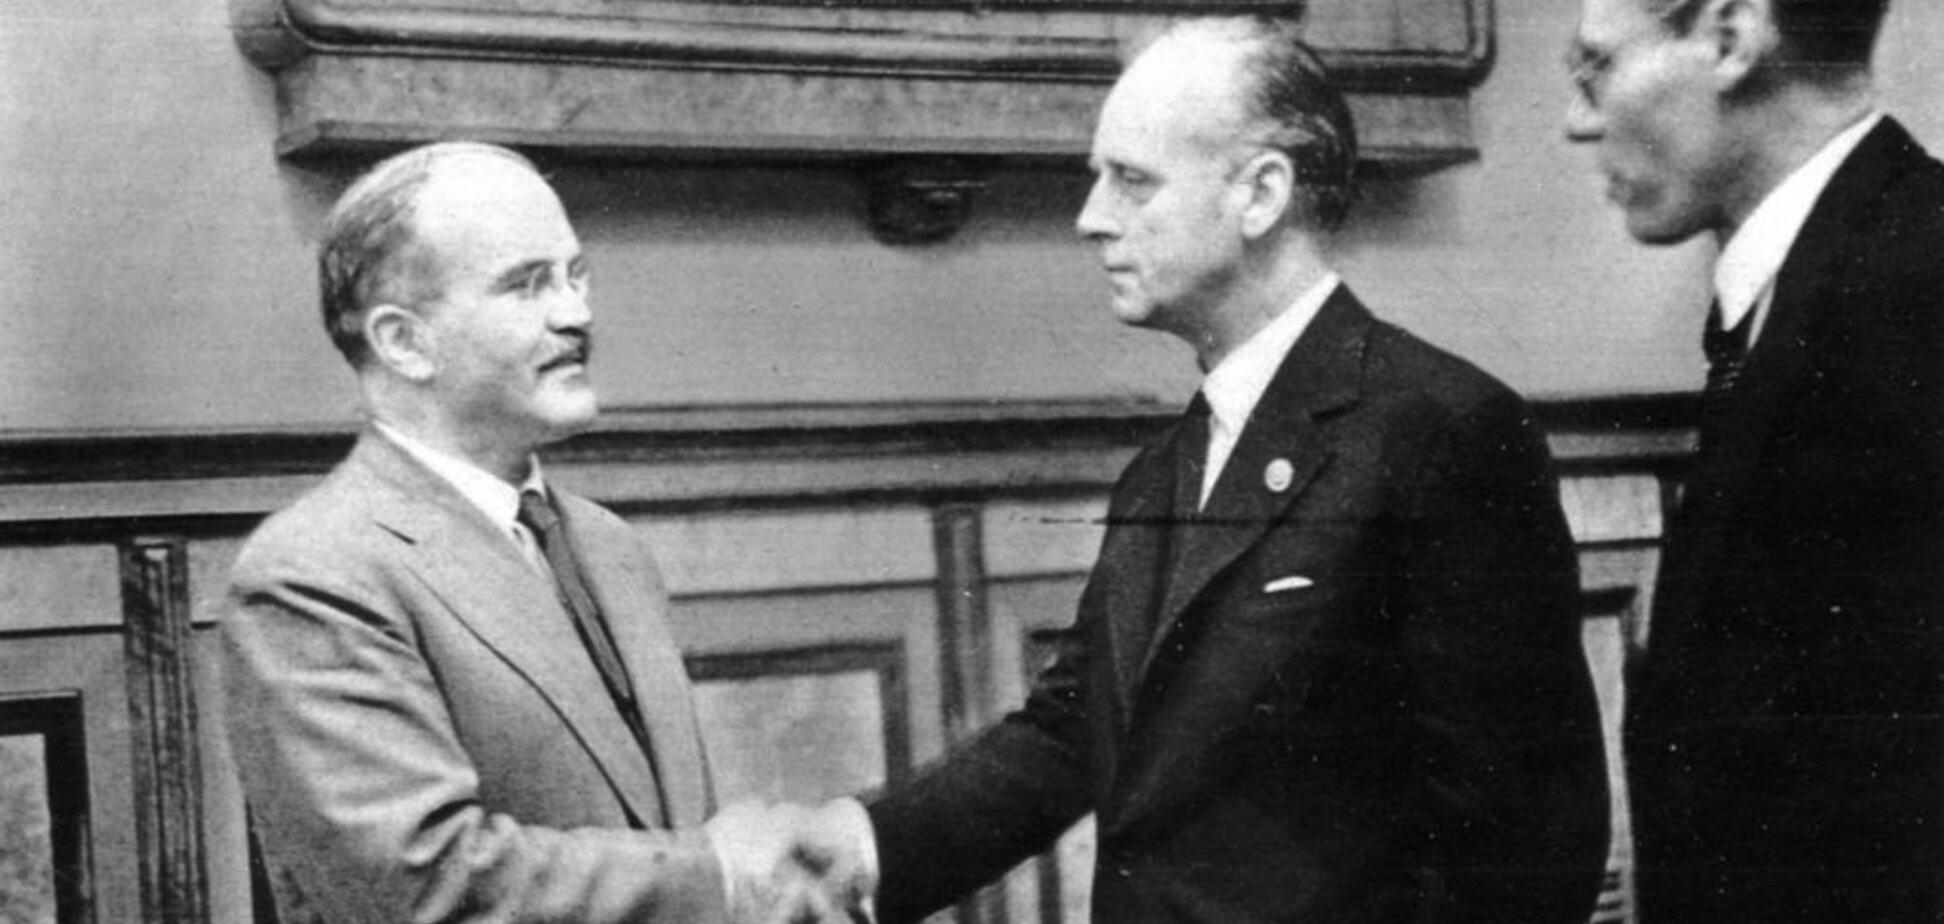 Сделка с Гитлером: хапнули и убили без совести. Ачотакова?